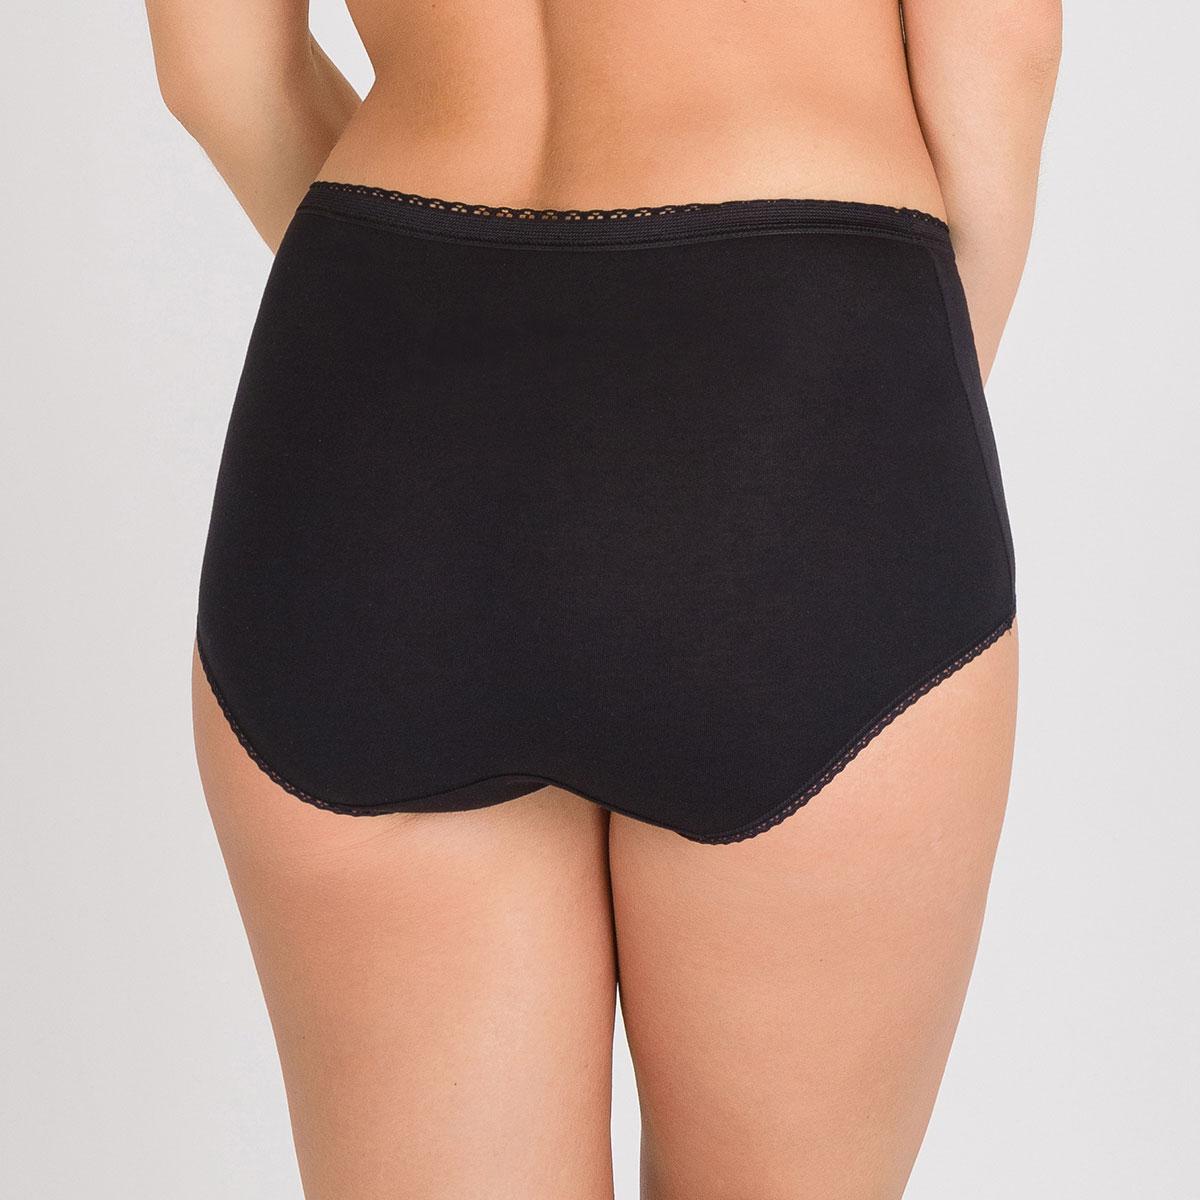 2 Culottes Maxi noires – Coton Stretch, , PLAYTEX